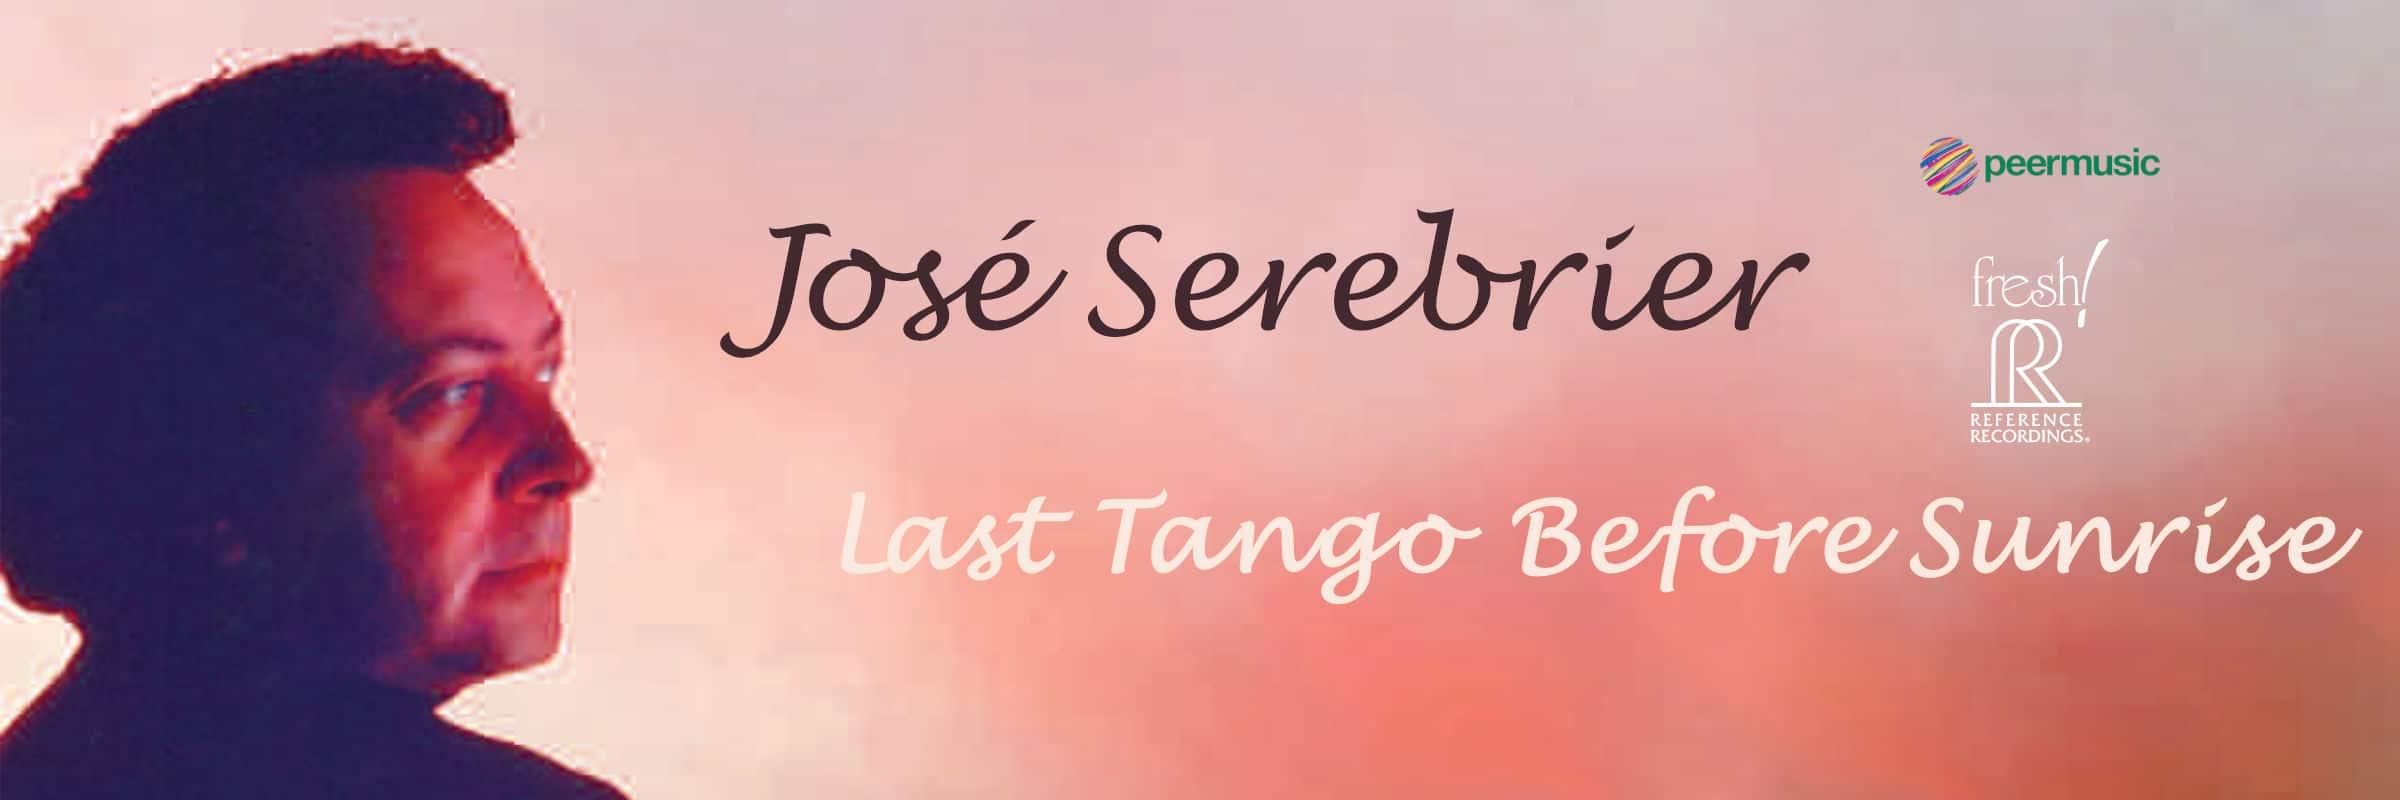 José Serebrier - Last Tango Before Sunrise